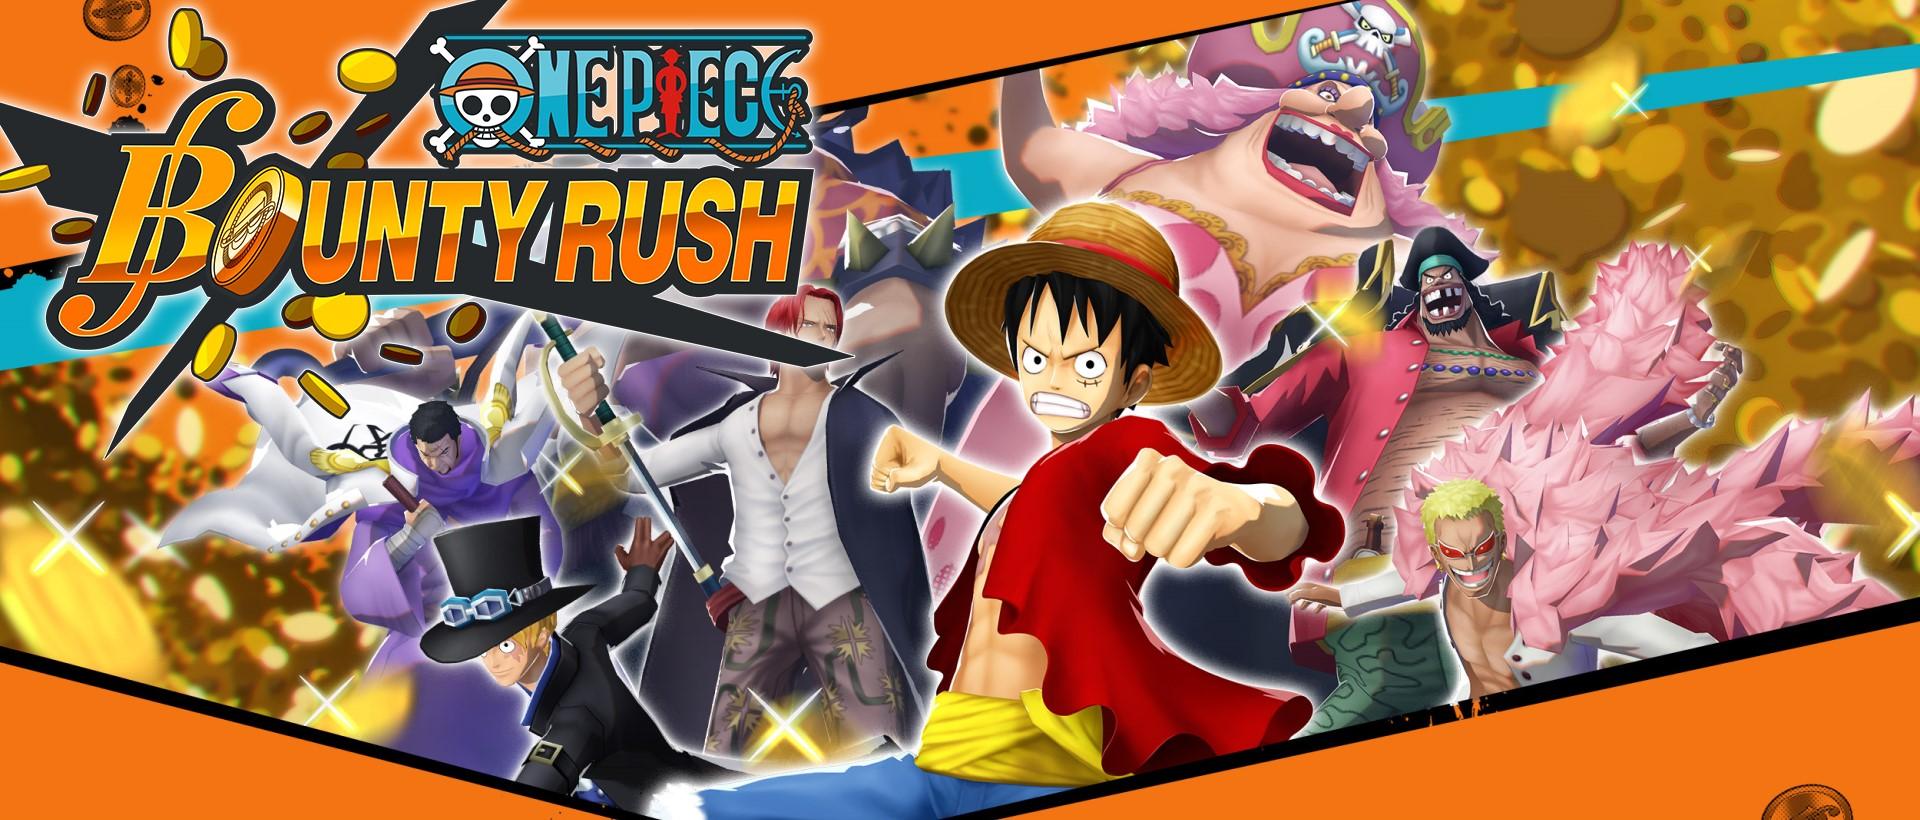 Unduh ONE PIECE Bounty Rush di PC dengan NoxPlayer-Game Center